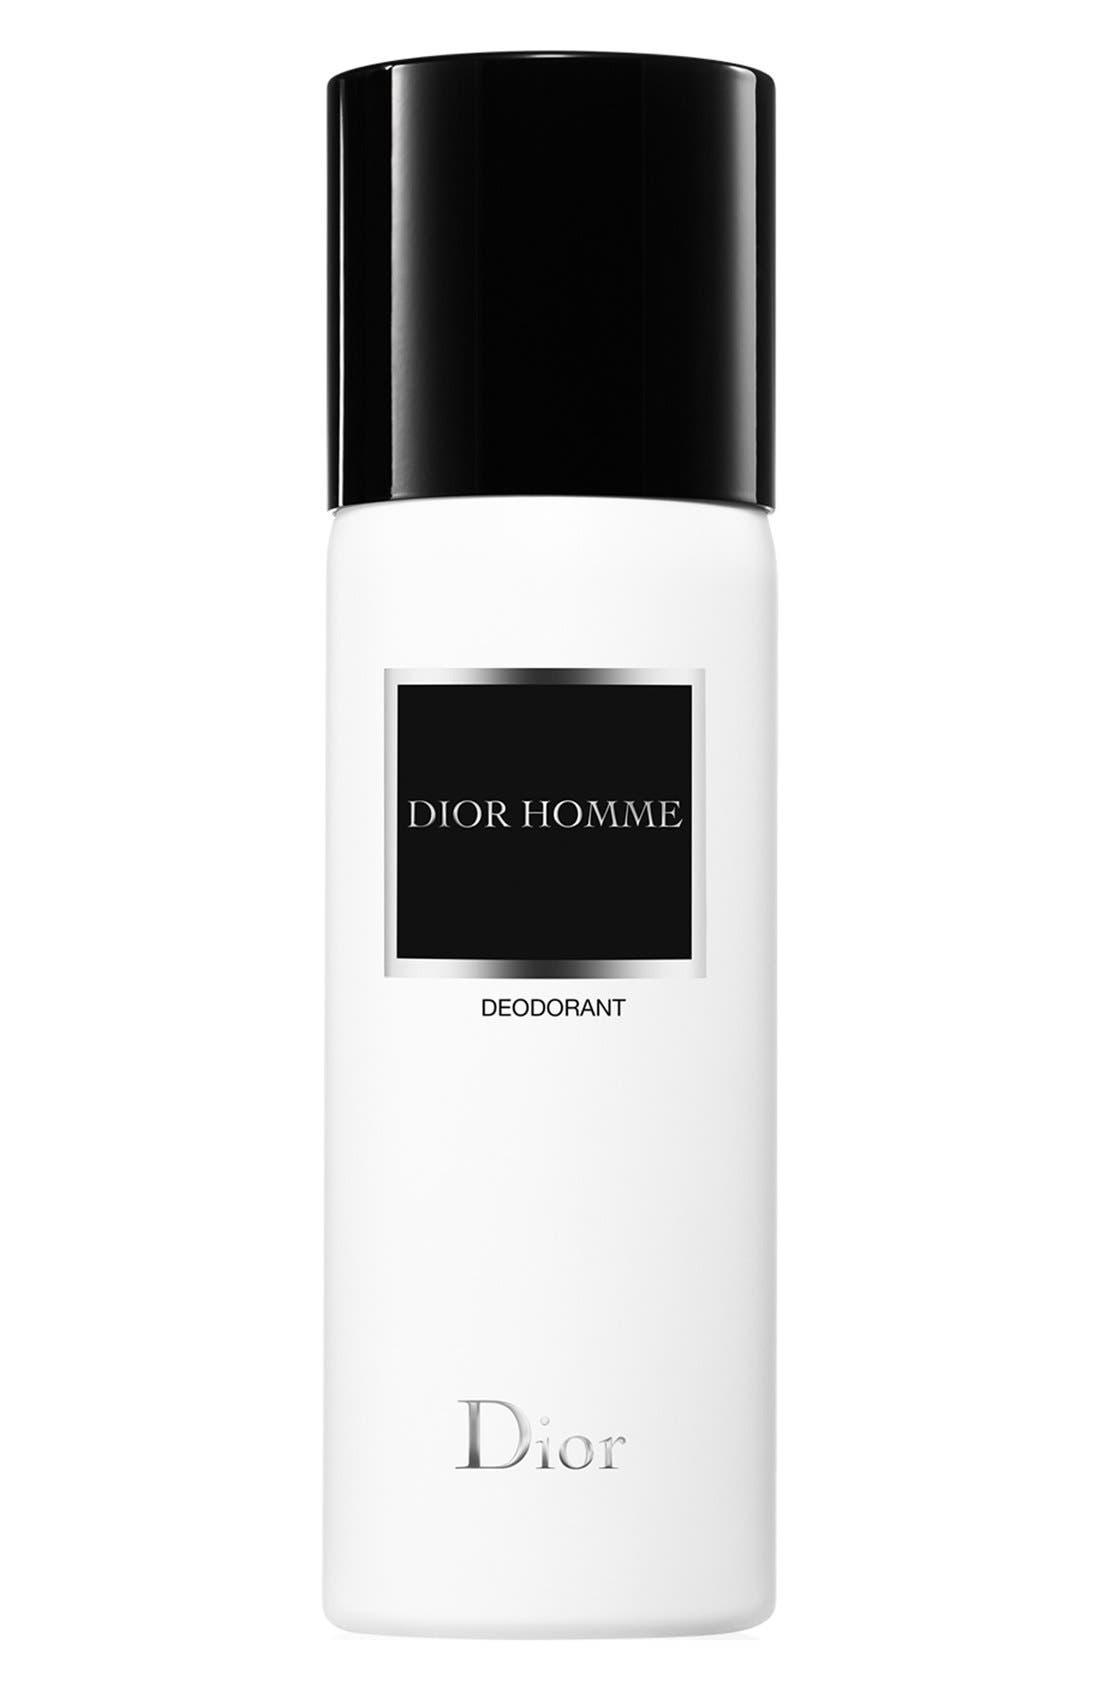 Dior Homme Deodorant Spray